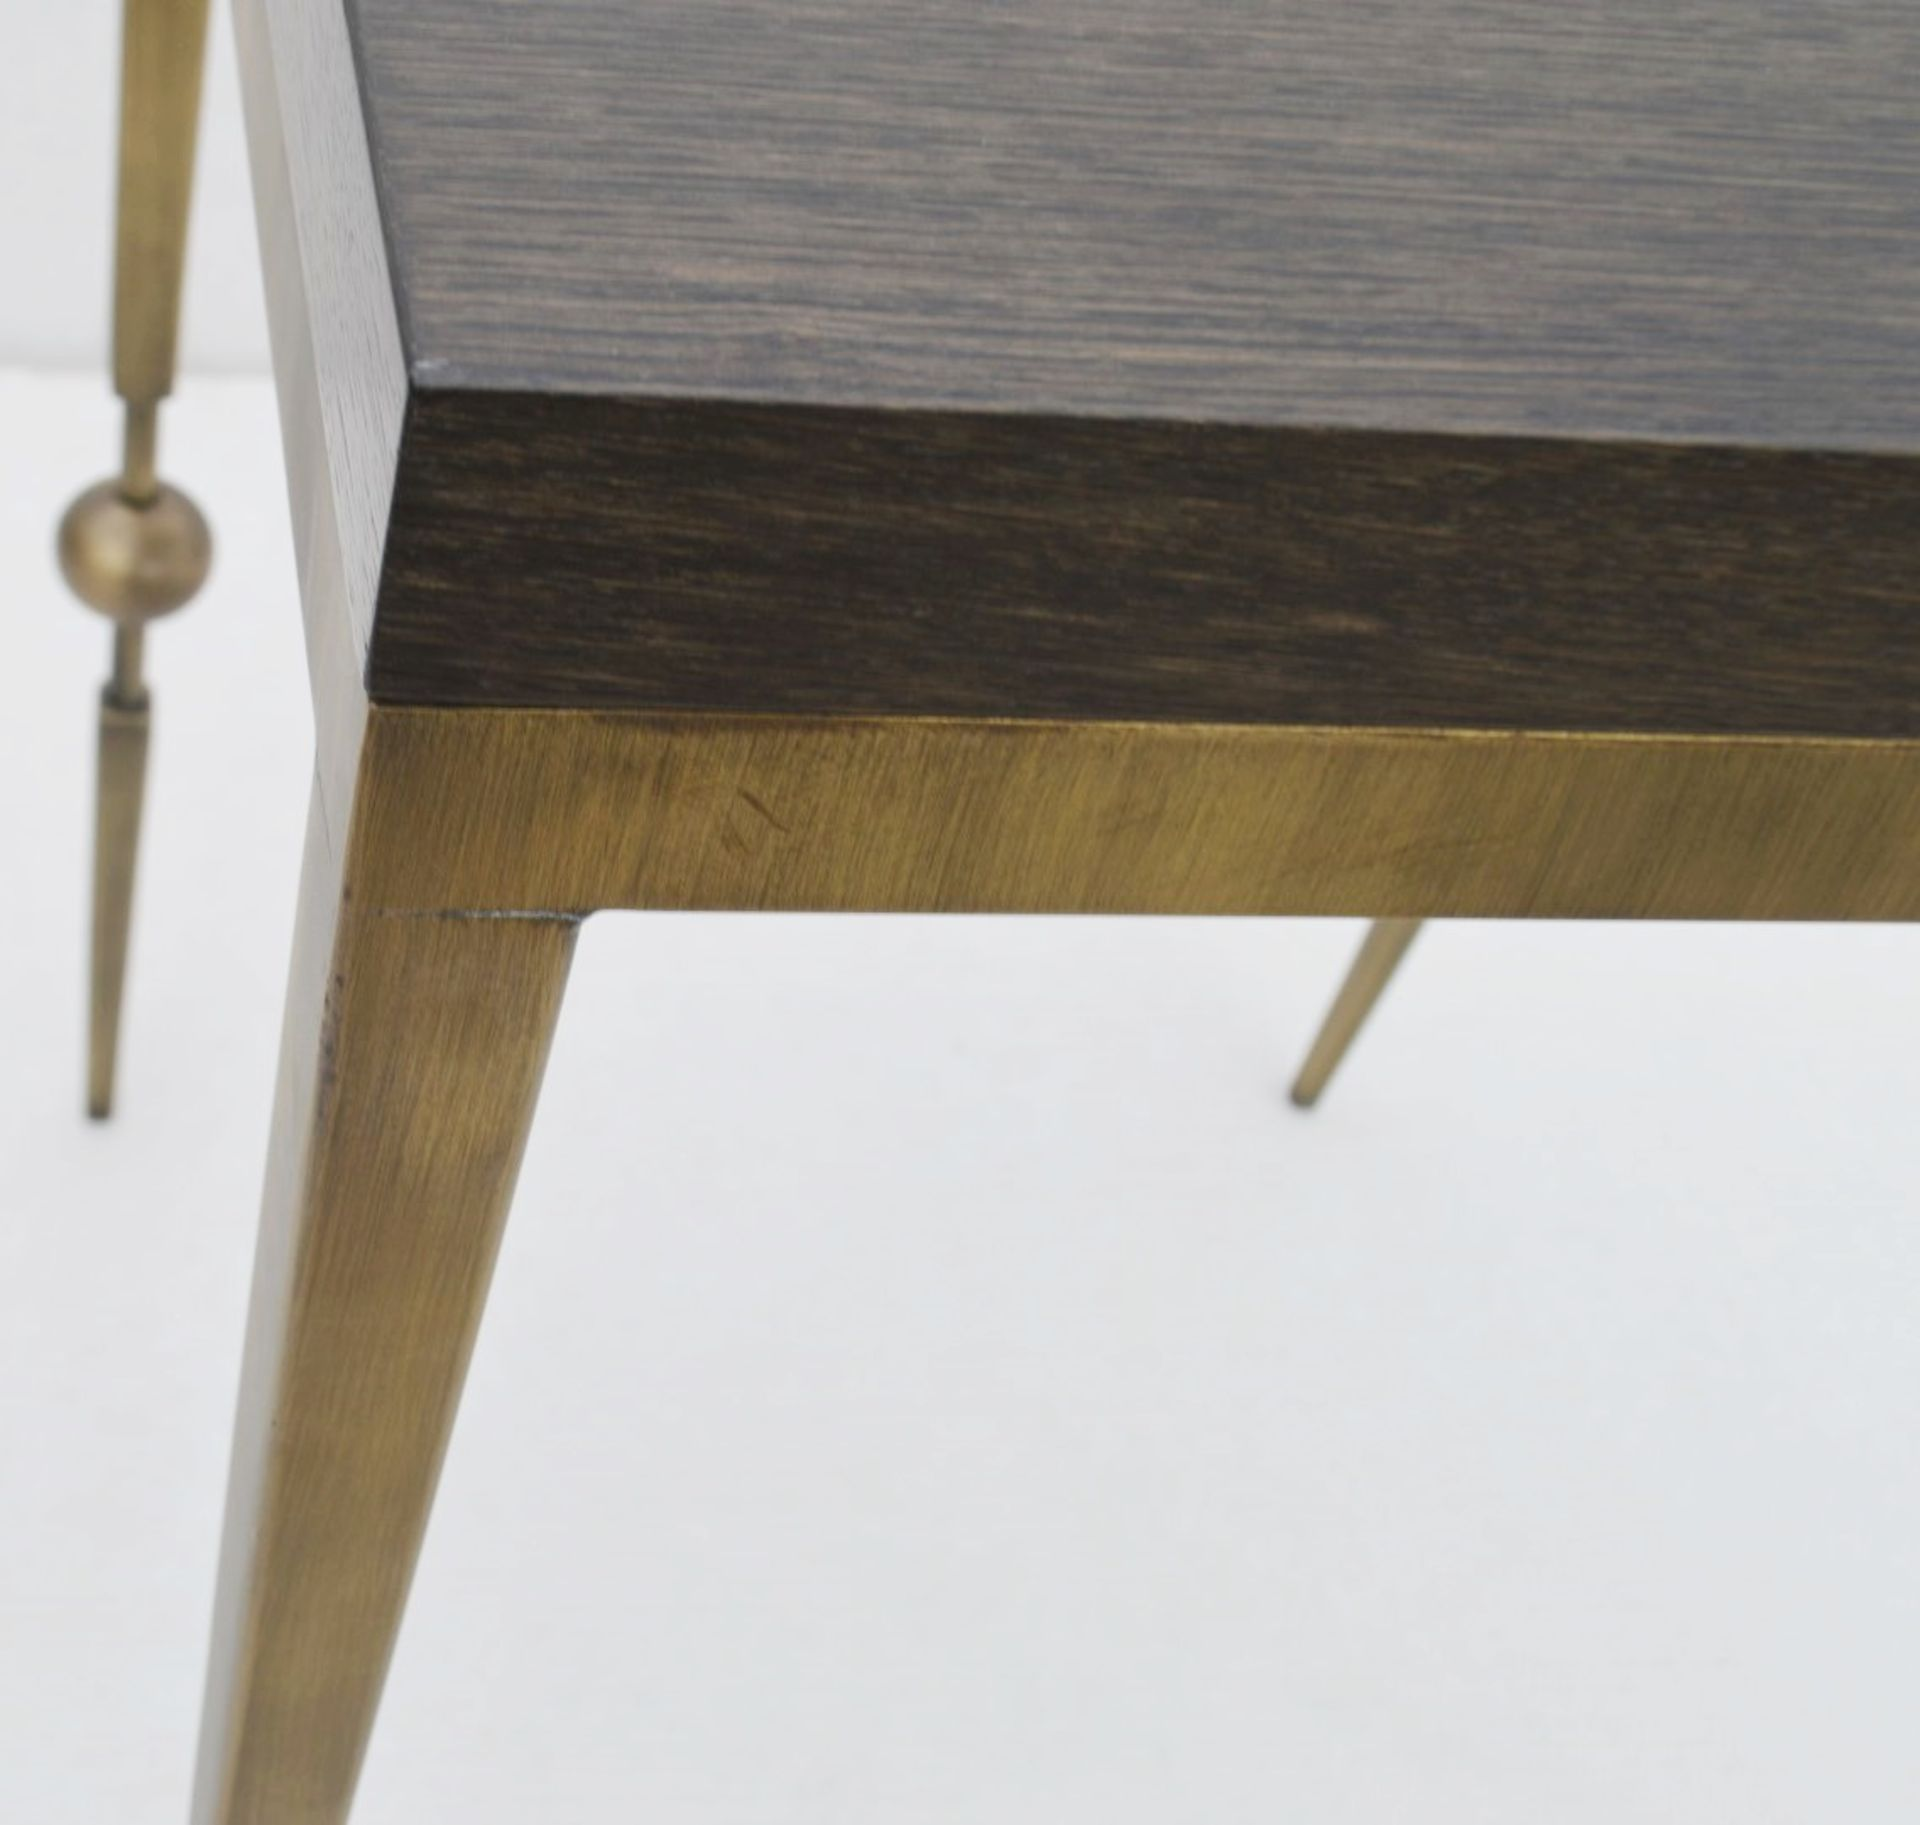 1 x JUSTIN VAN BREDA 'Sphere' Designer Occasional Table - Dimensions: H70 x W52 x D52cm - Ref: - Image 5 of 7